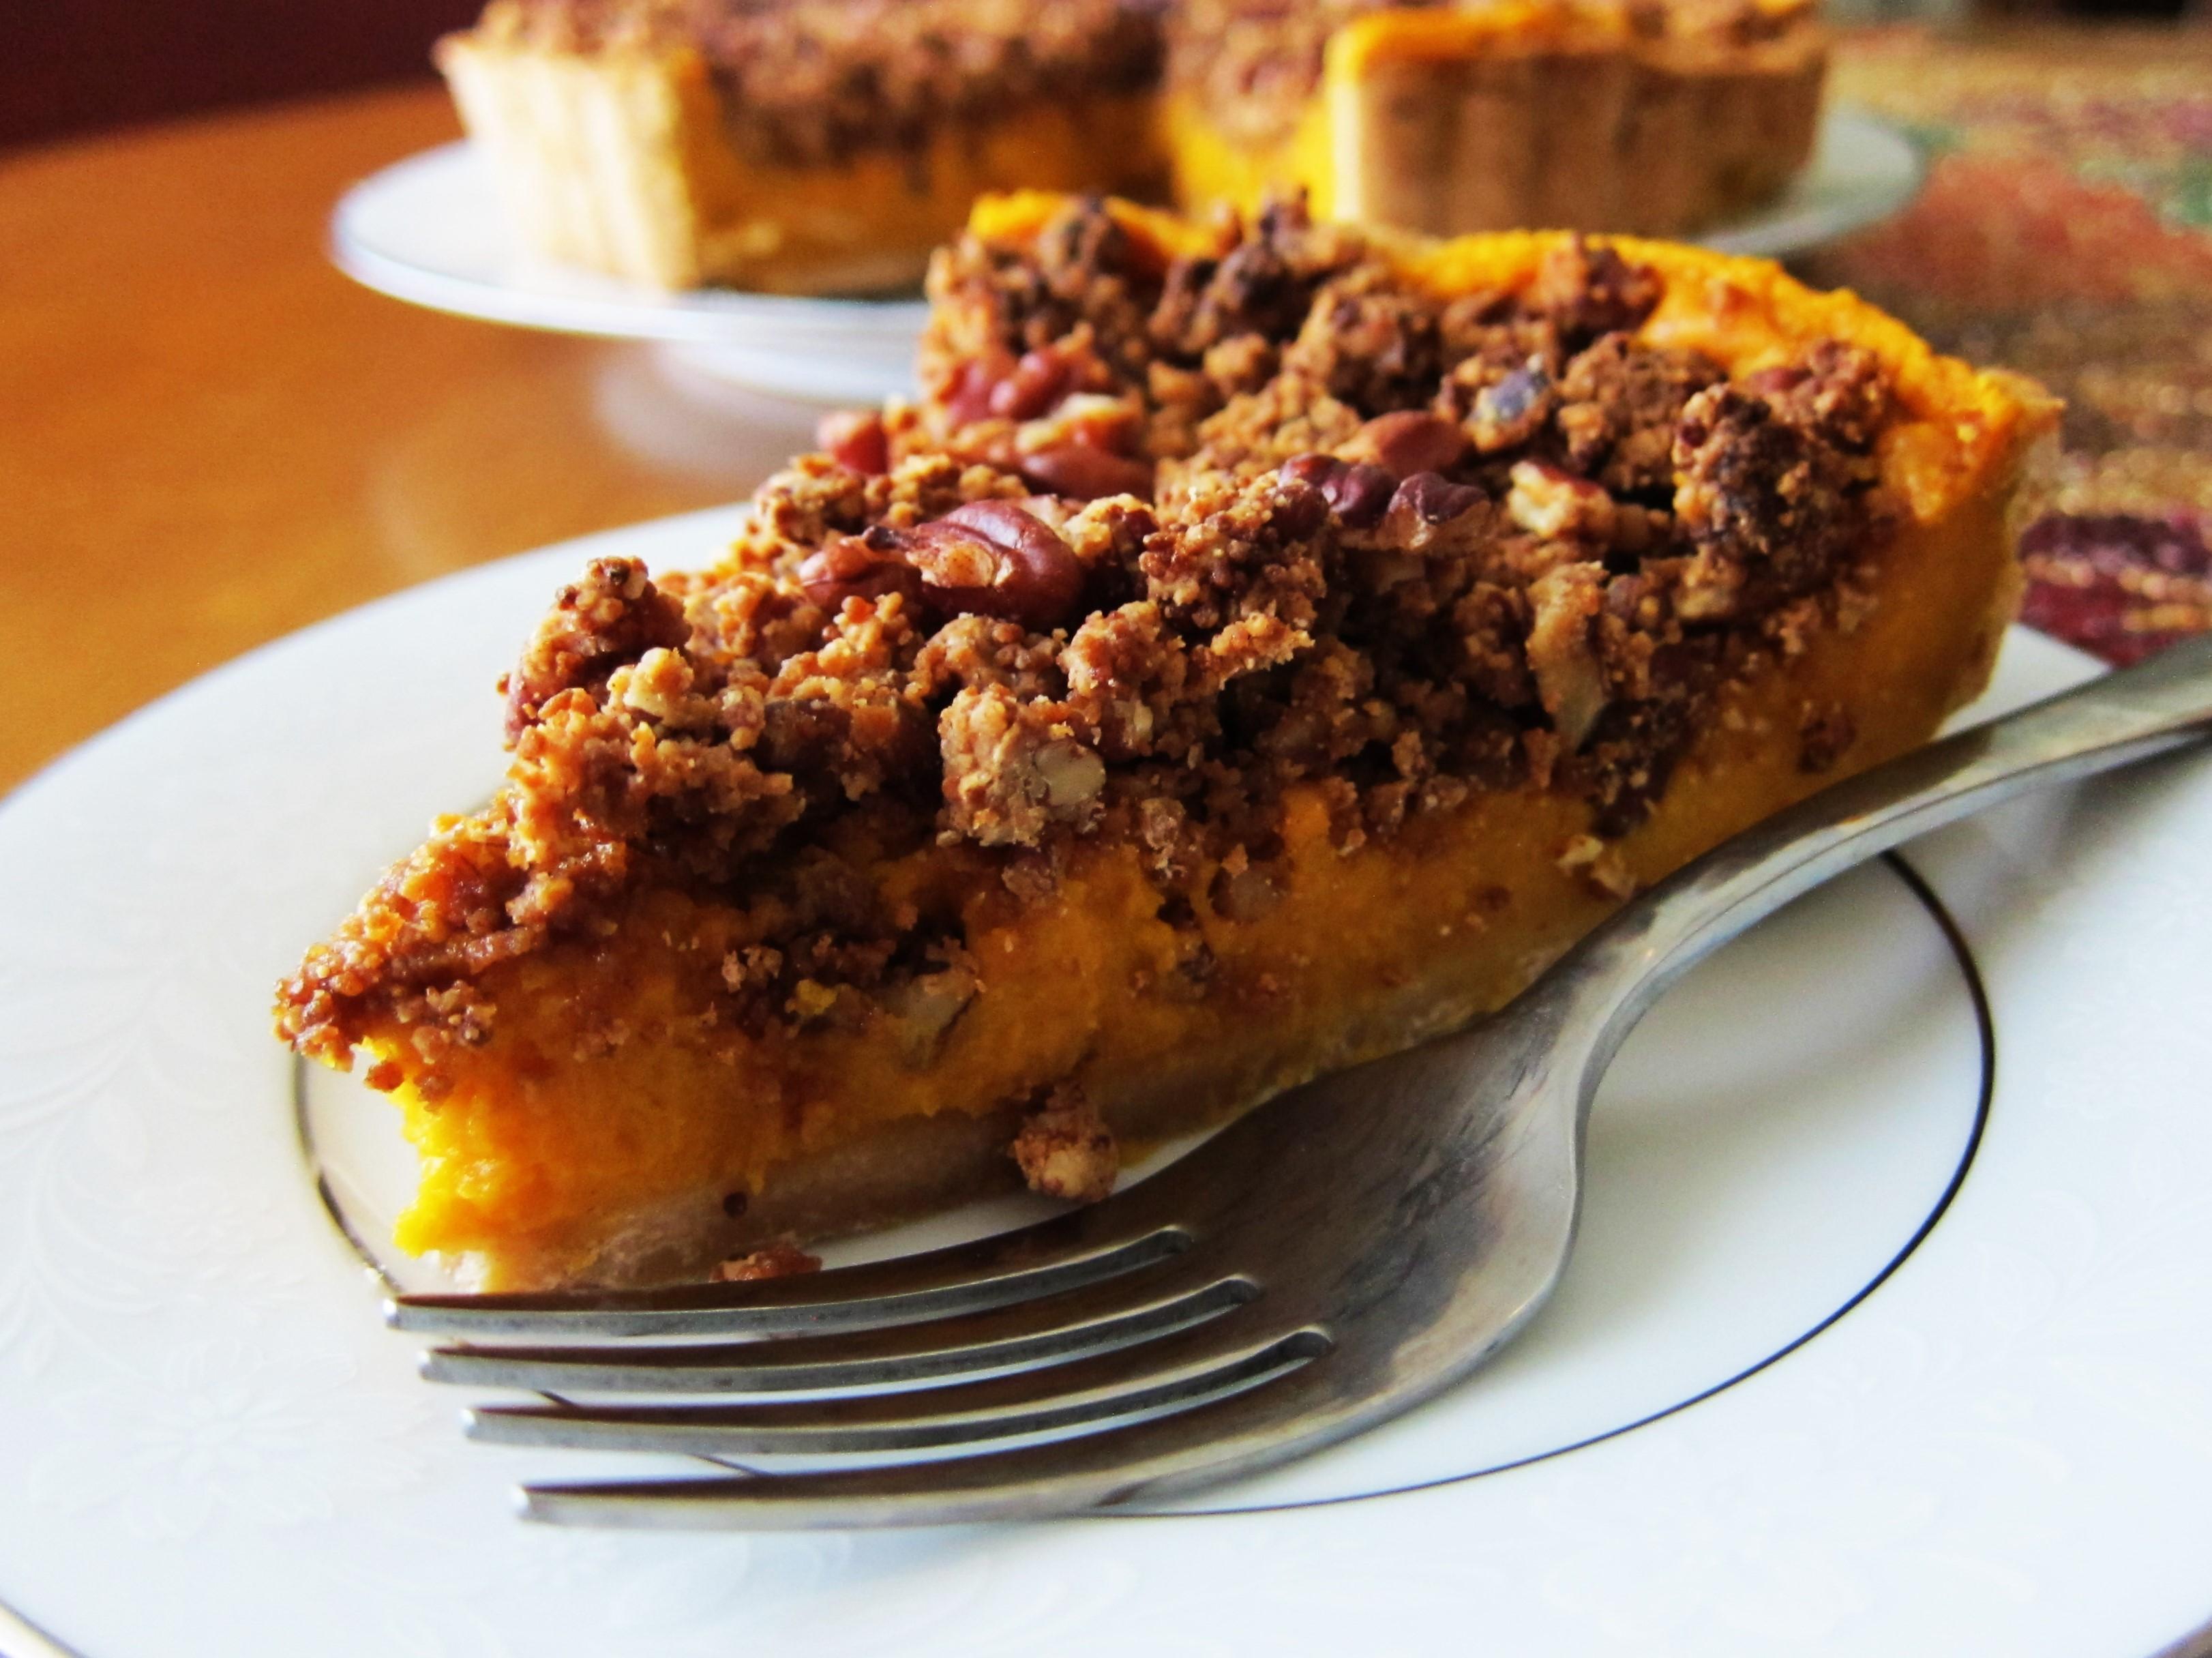 Vegan Sweet Potato Tart with Cinnamon Pecan Streusel Topping